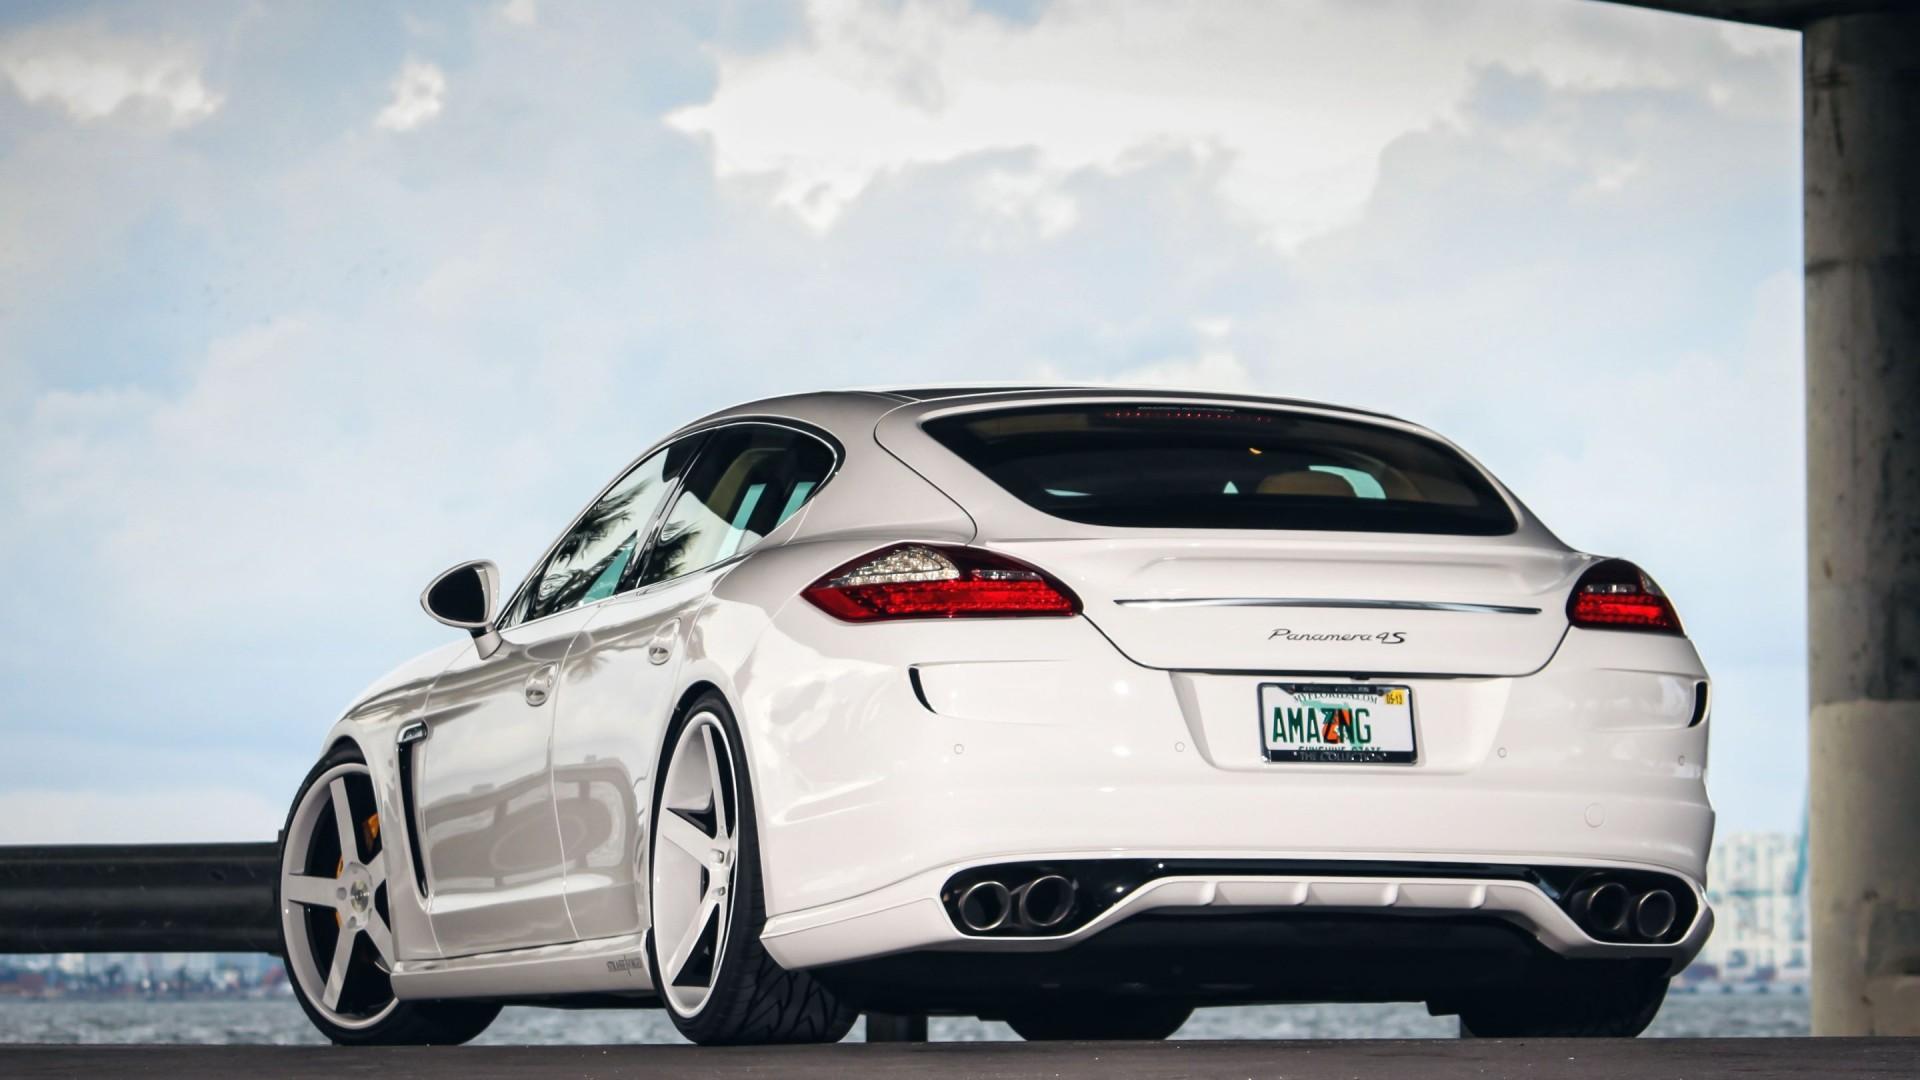 Porsche Panamera Car Hd Wallpaper For Desktop And Mobiles